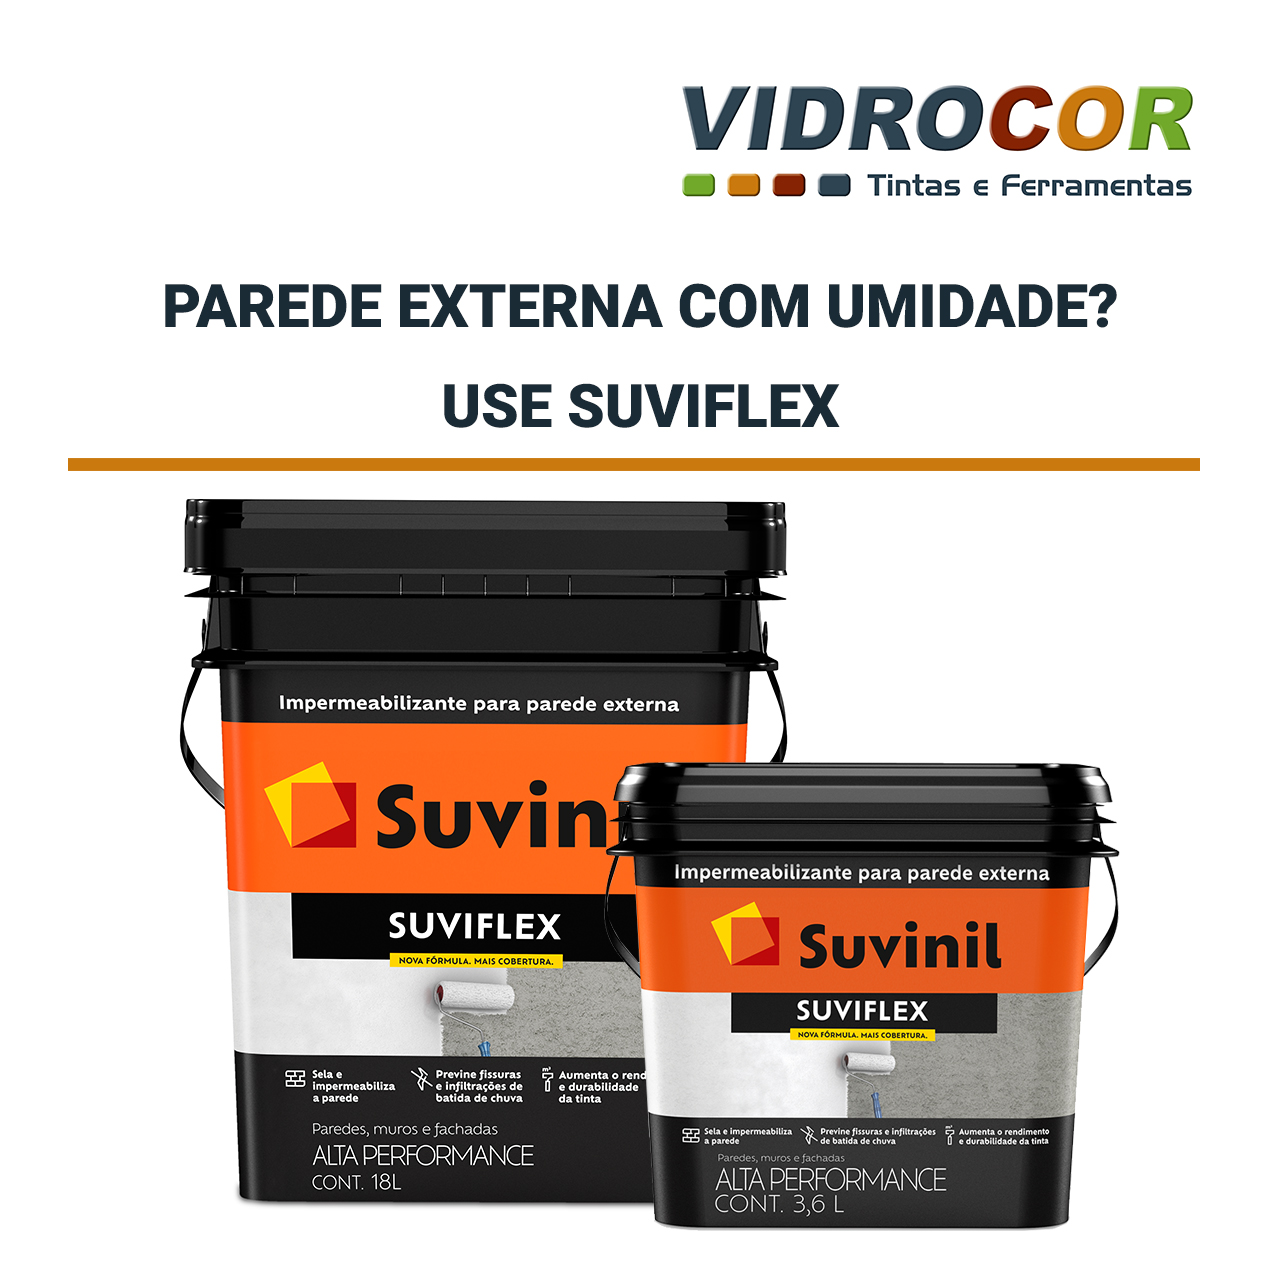 SUVIFLEX NA VIDROCOR LOJA DE TINTA